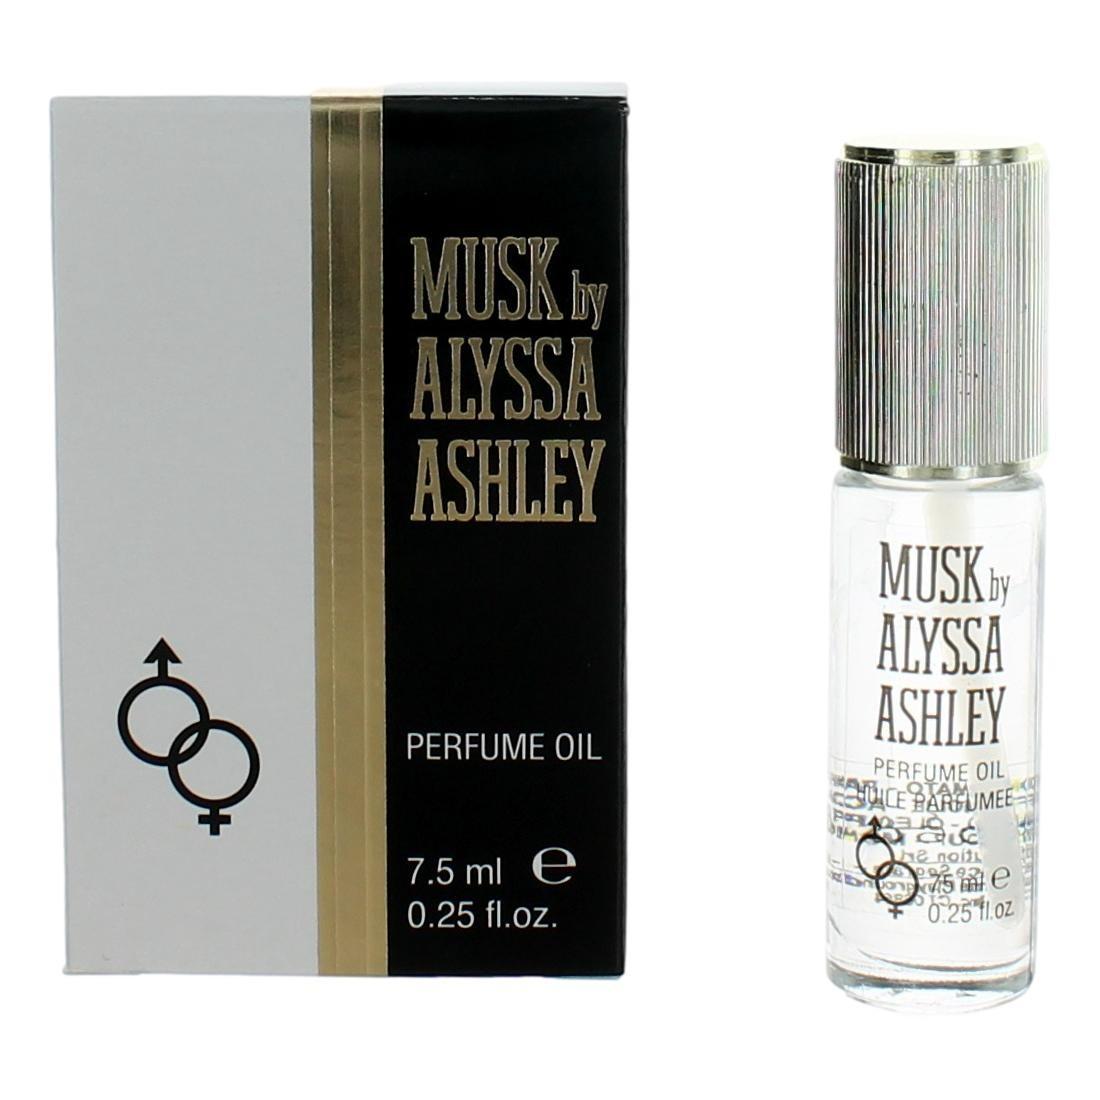 Musk by Alyssa Ashley, .25 oz Perfume Oil for Women